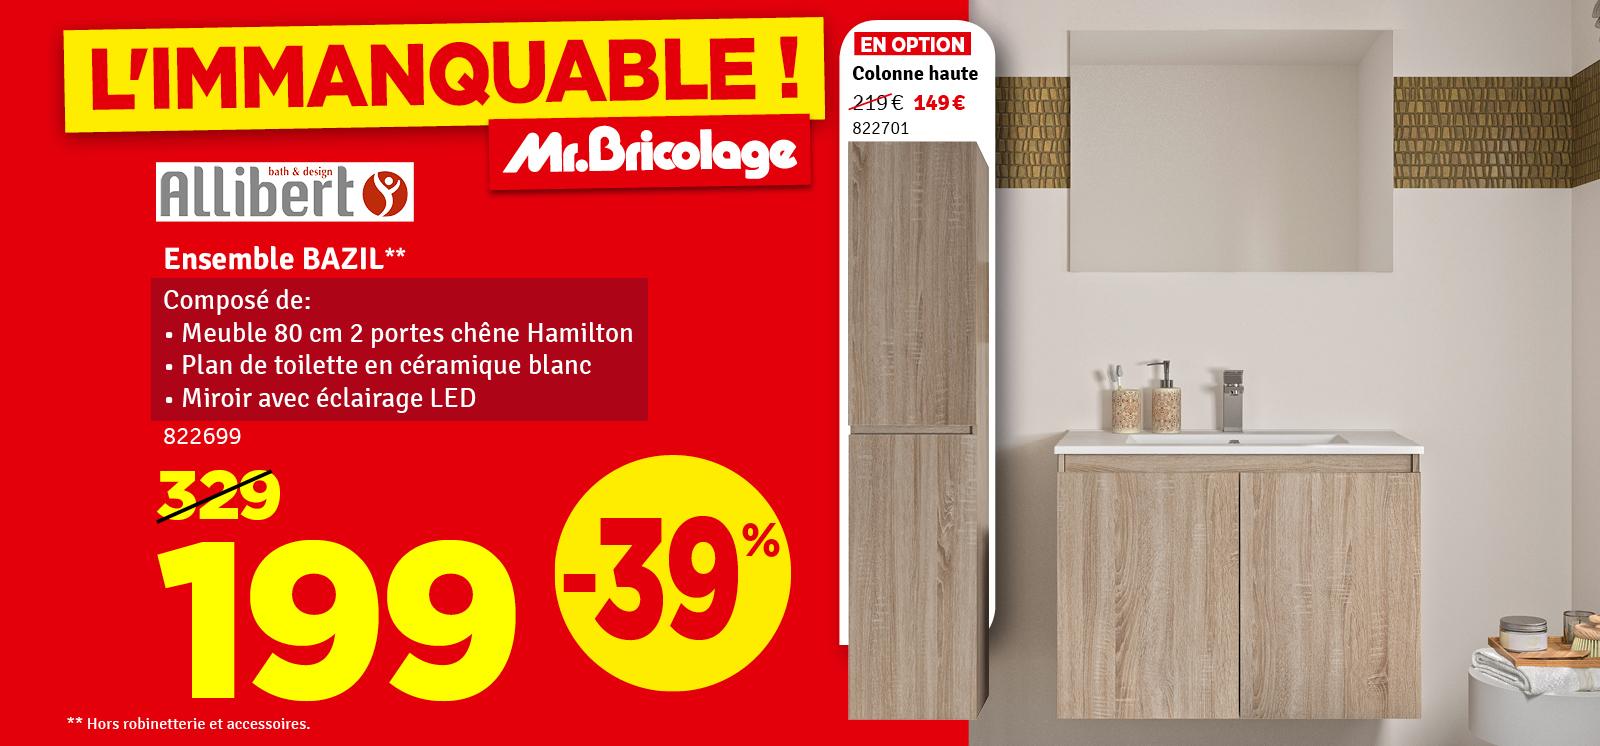 Promo - Ensemble de salle de bain Bazil avec portes 80 cm chêne hamilton ALLIBERT